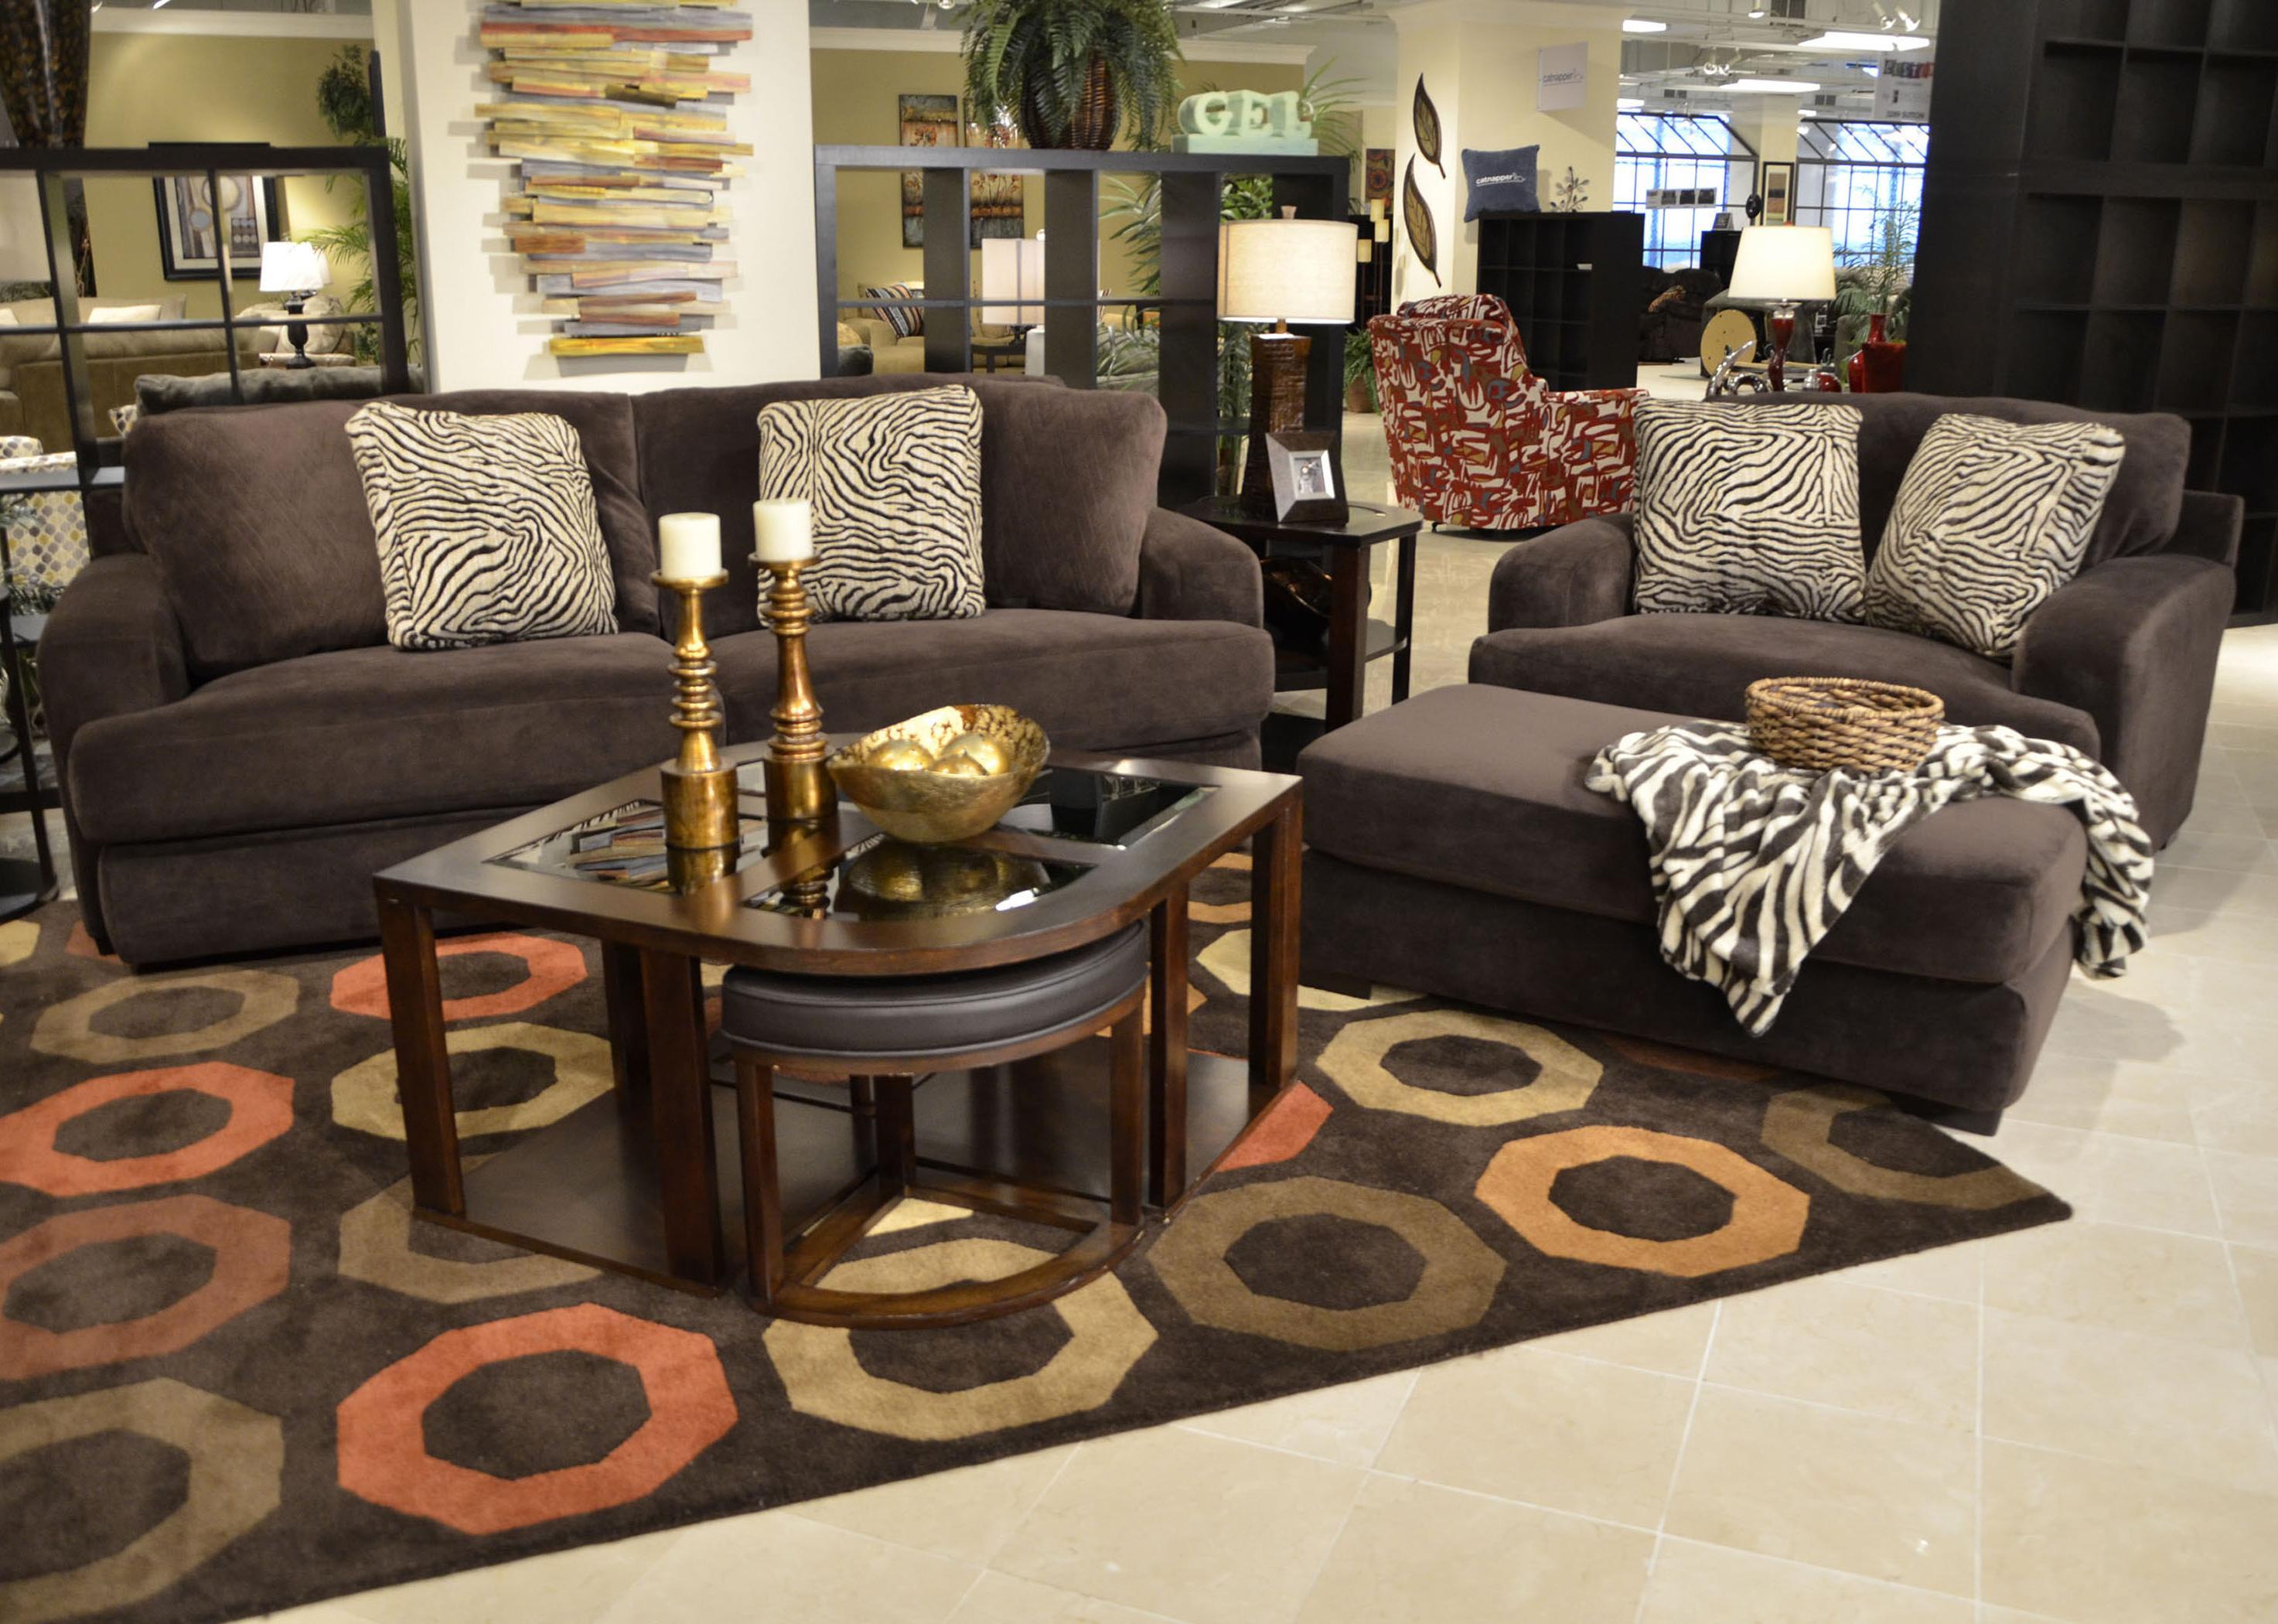 Jackson Furniture Palisades Stationary Living Room Group - Item Number: 4186 Living Room Group 2